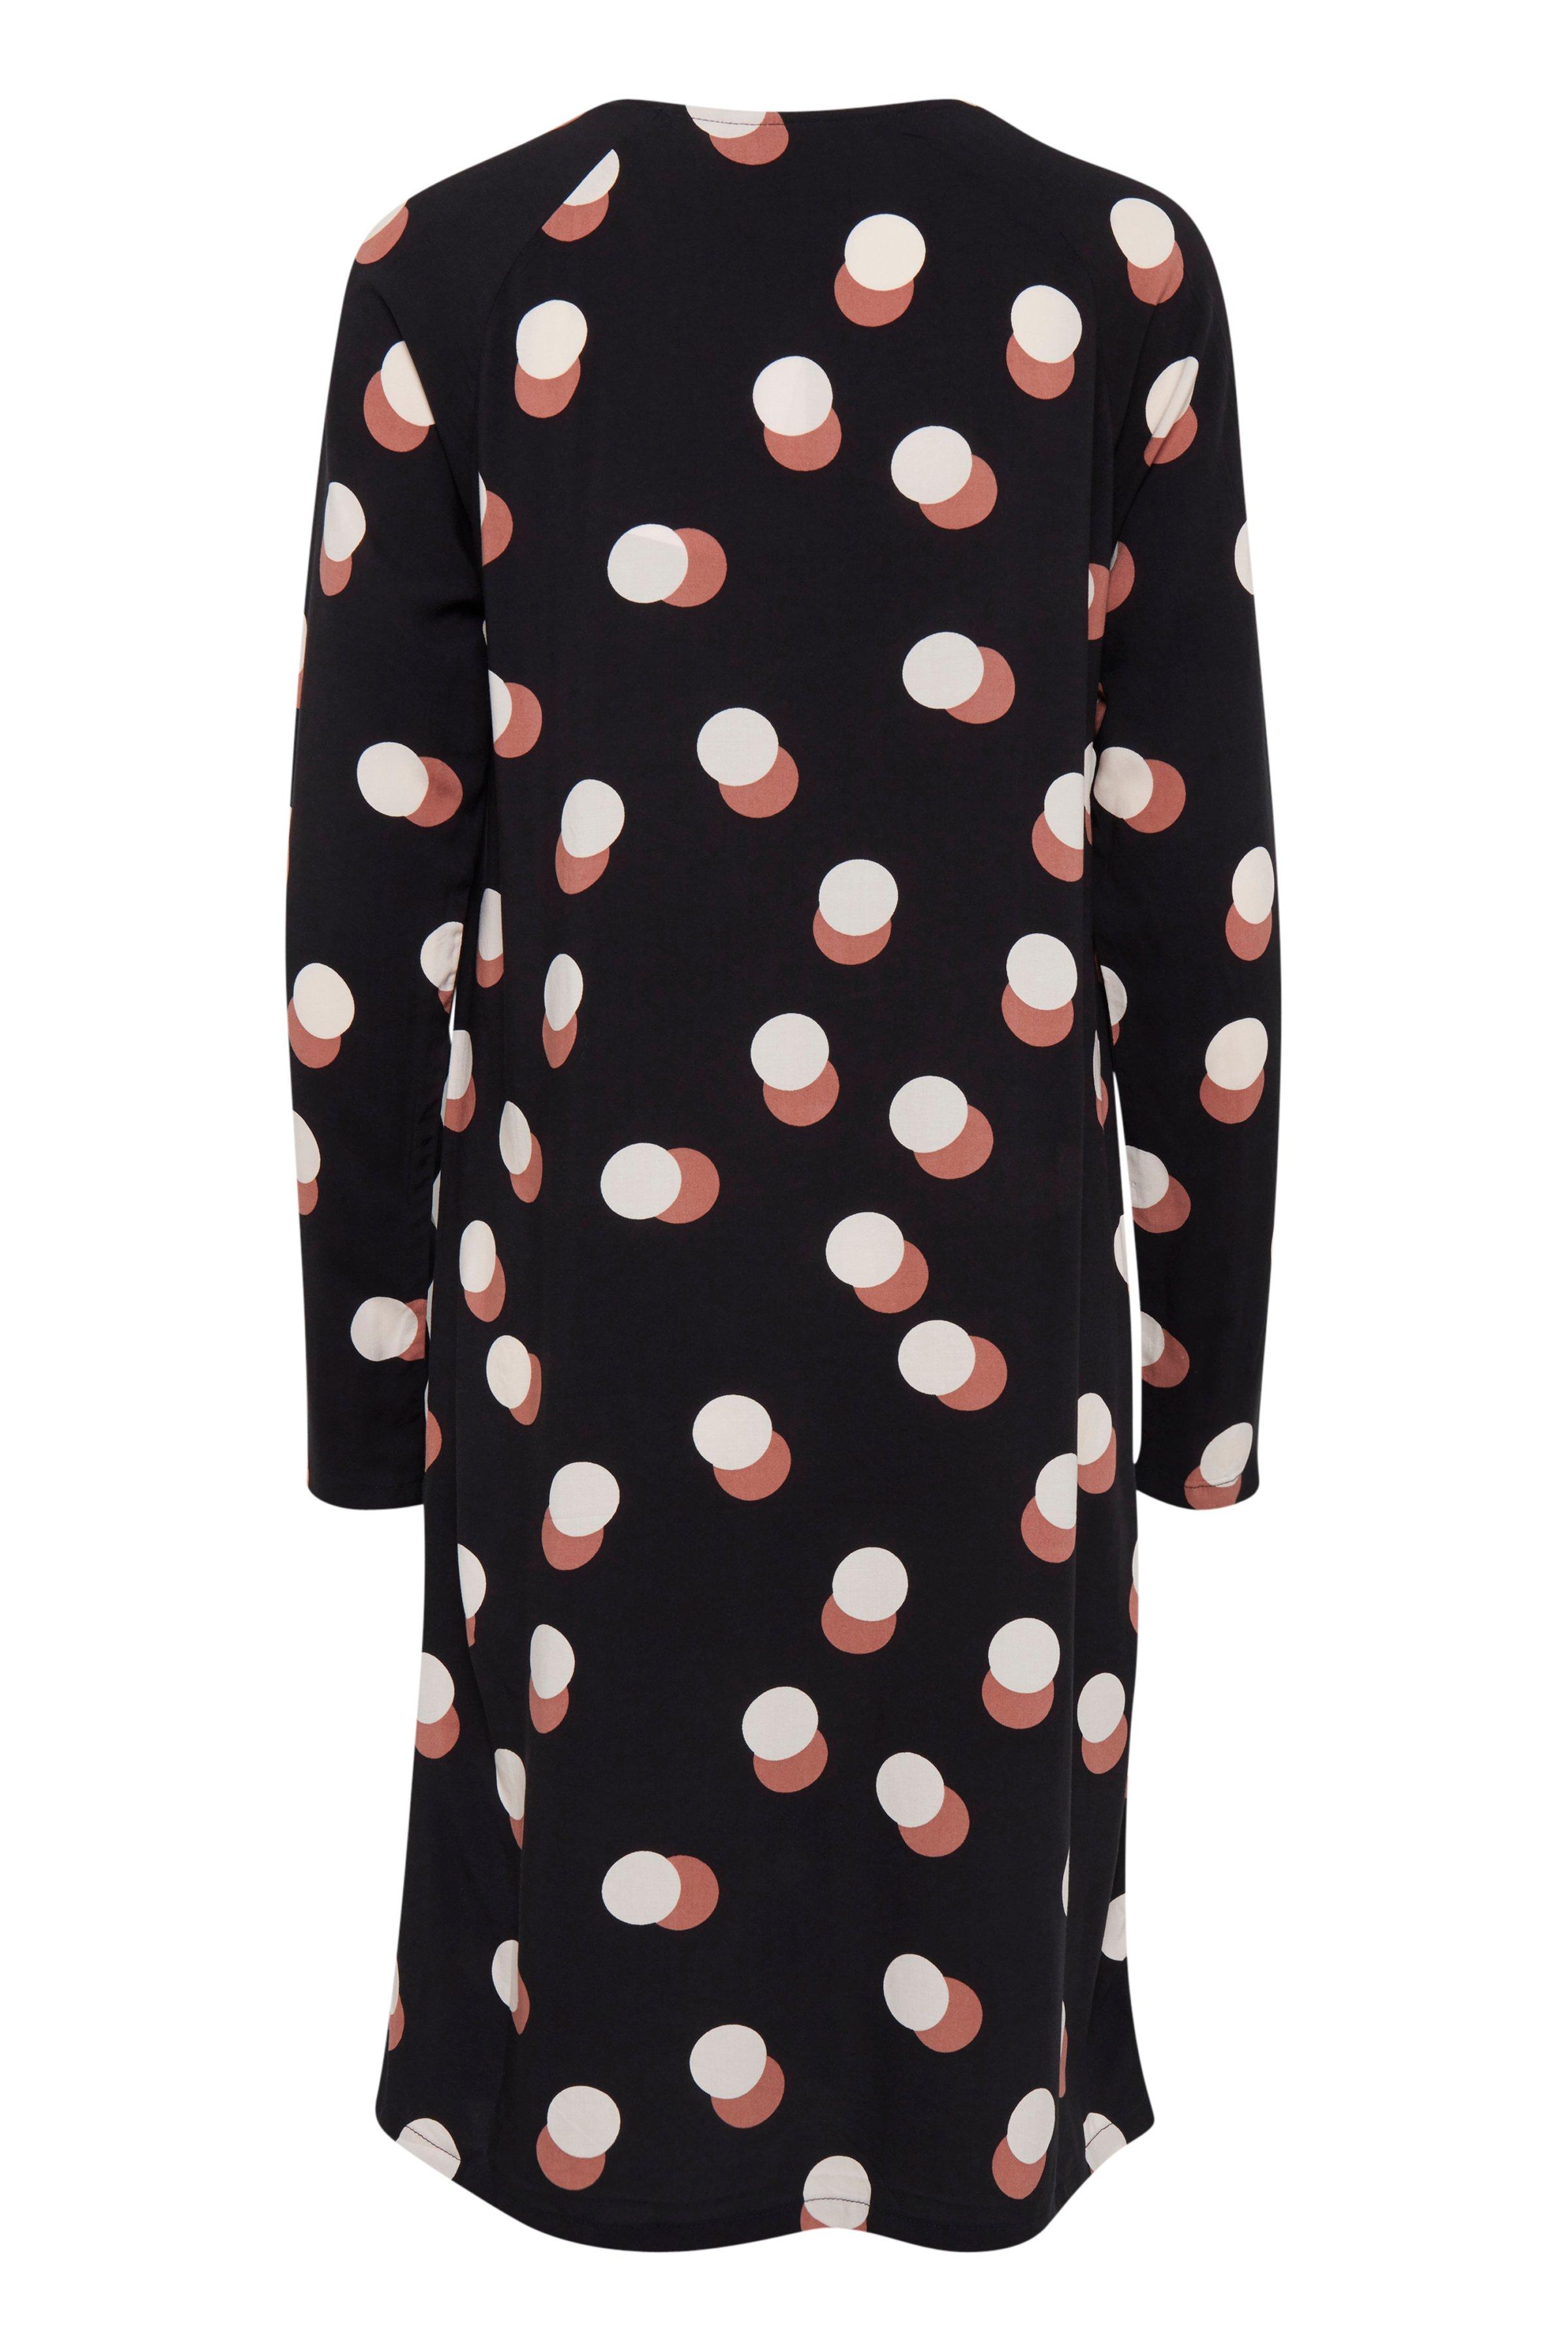 Dark Navy Dot Kjole – Køb Dark Navy Dot Kjole fra str. S-XXL her